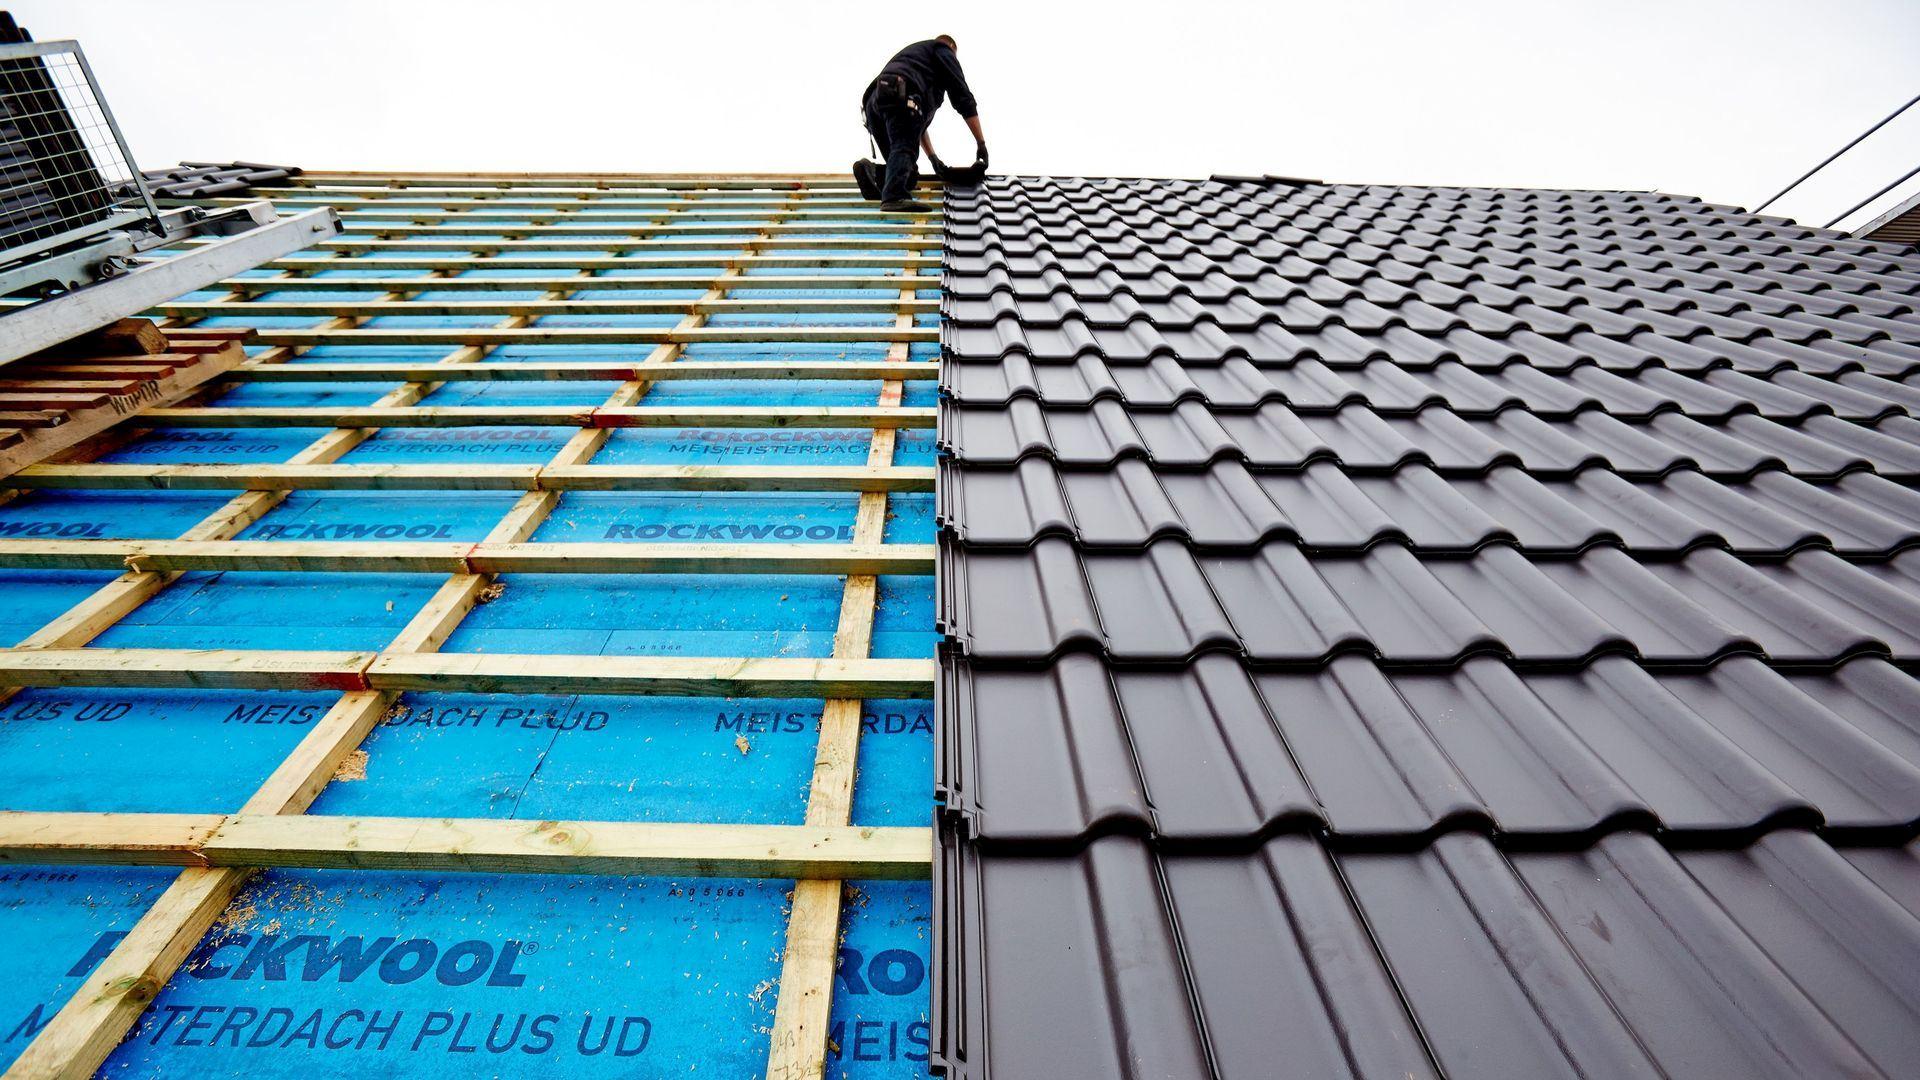 rockwool forum, education, seminar, program, roof, pitched roof, pitched roof insulation, meisterdach, masterrock, installation, das sichere schrägdach, germany